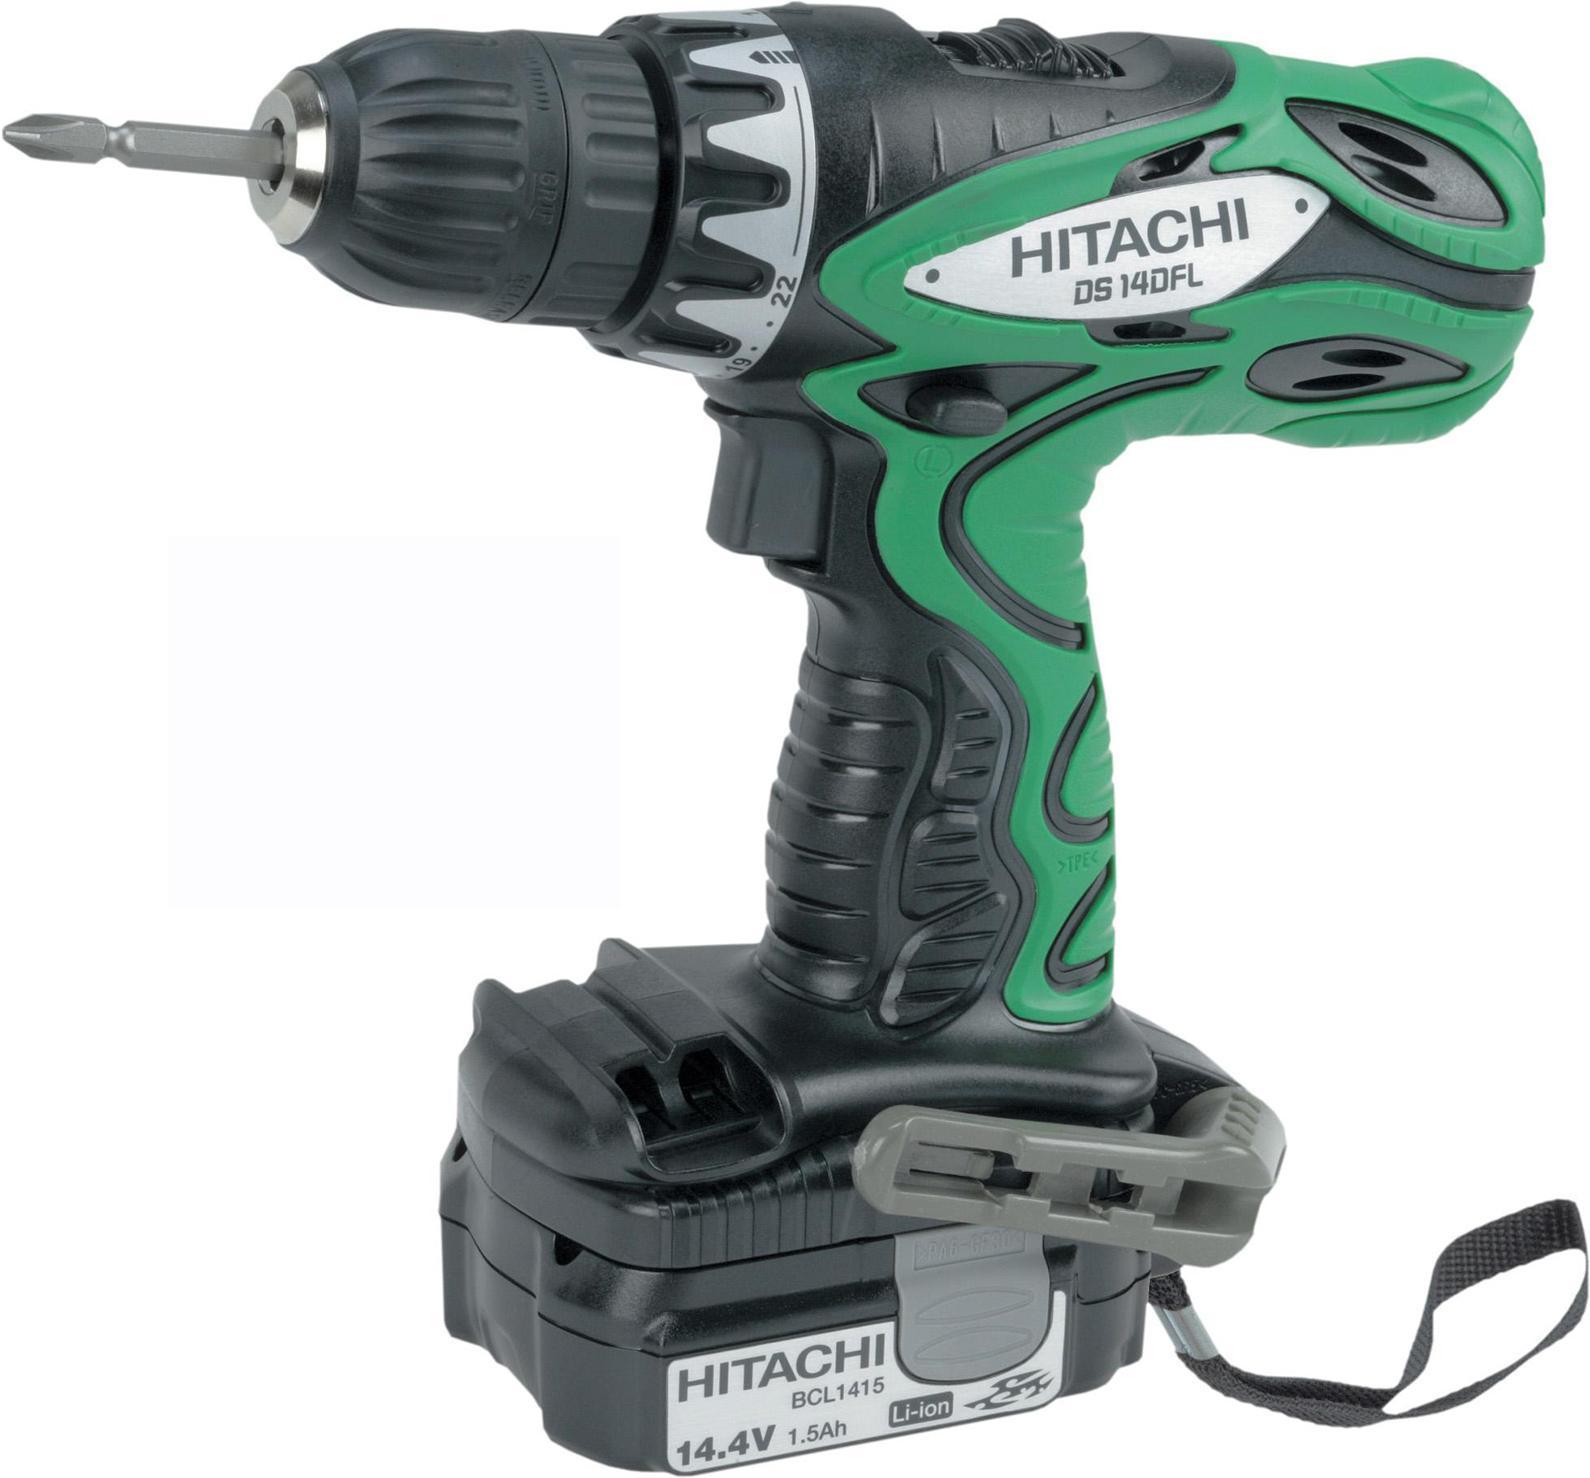 Hitachi DS14DFL аккумуляторный шуруповертDS14DFL